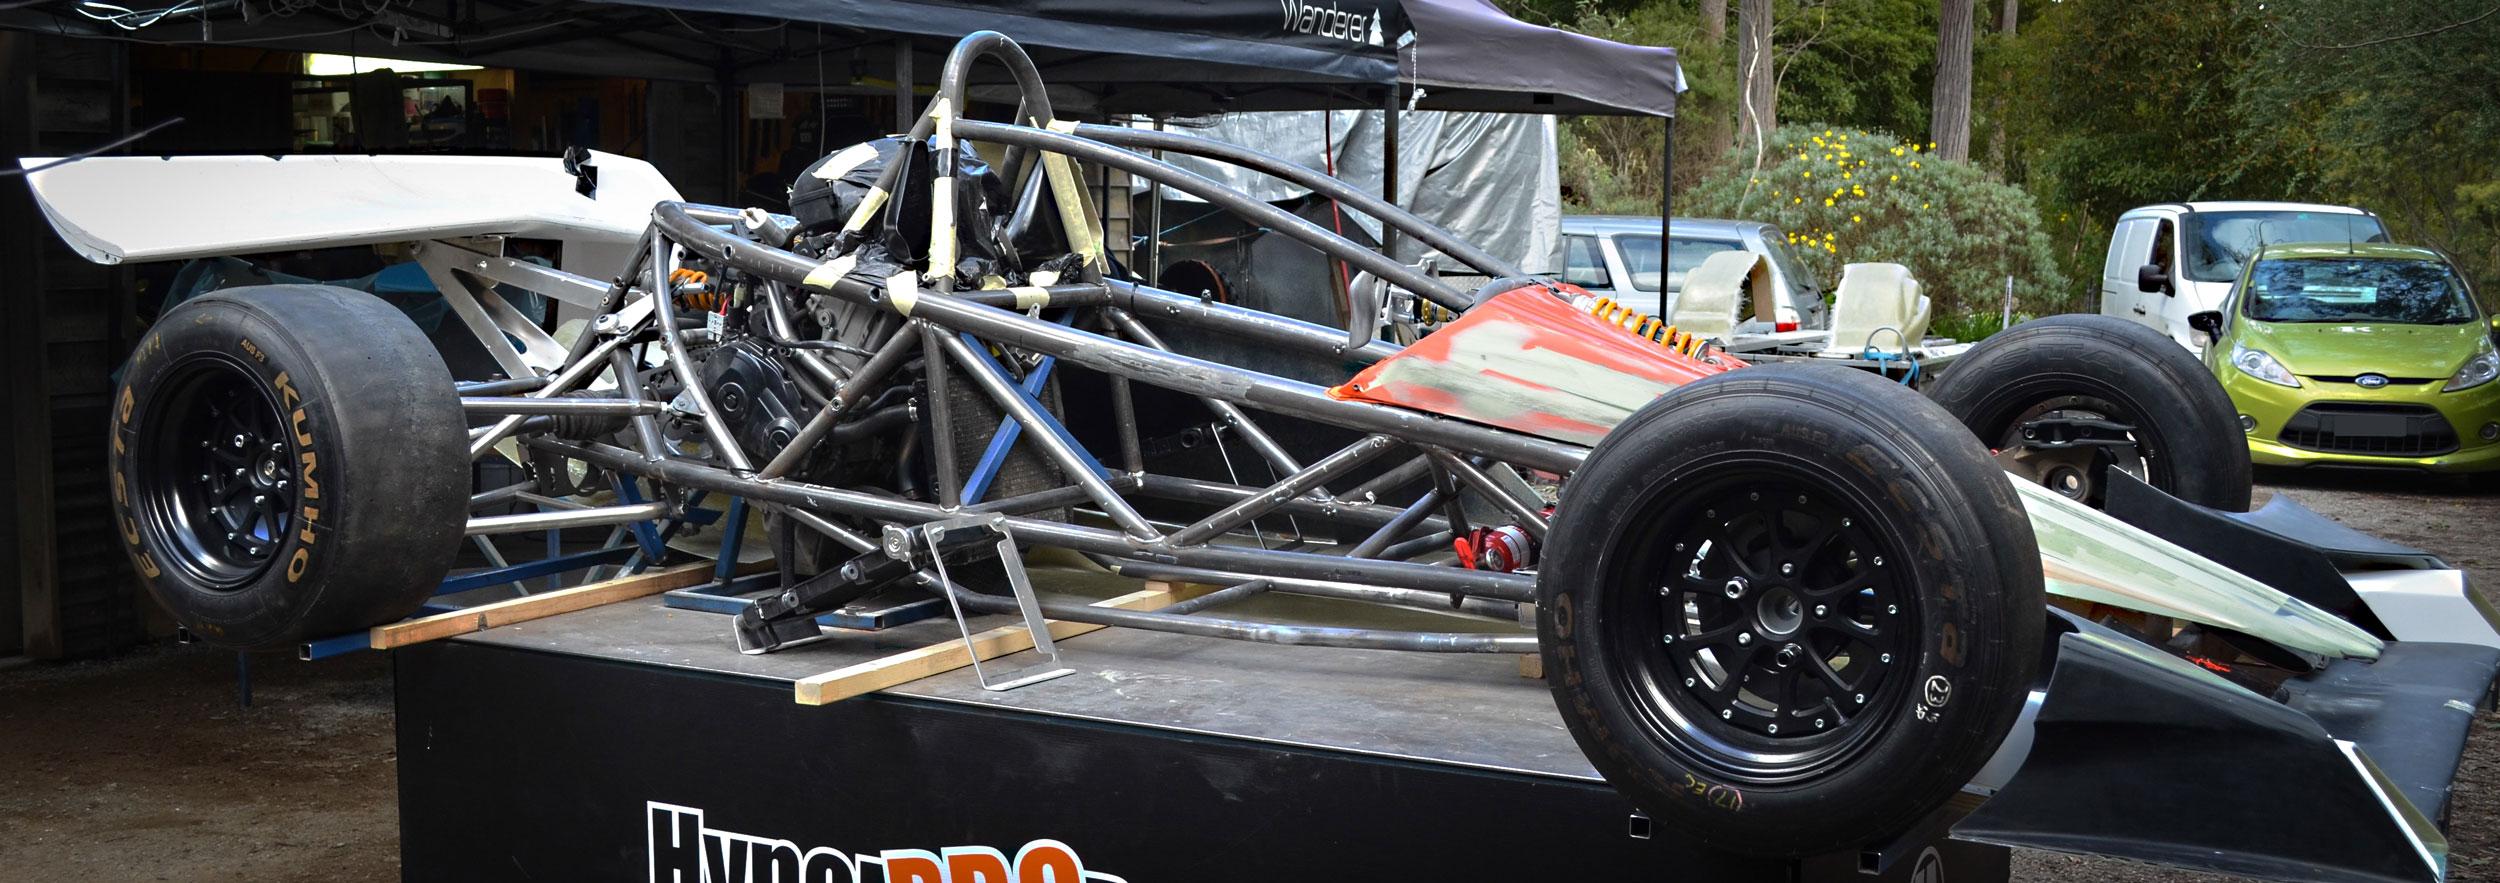 Hyper-Racer-X1-front-34-2500